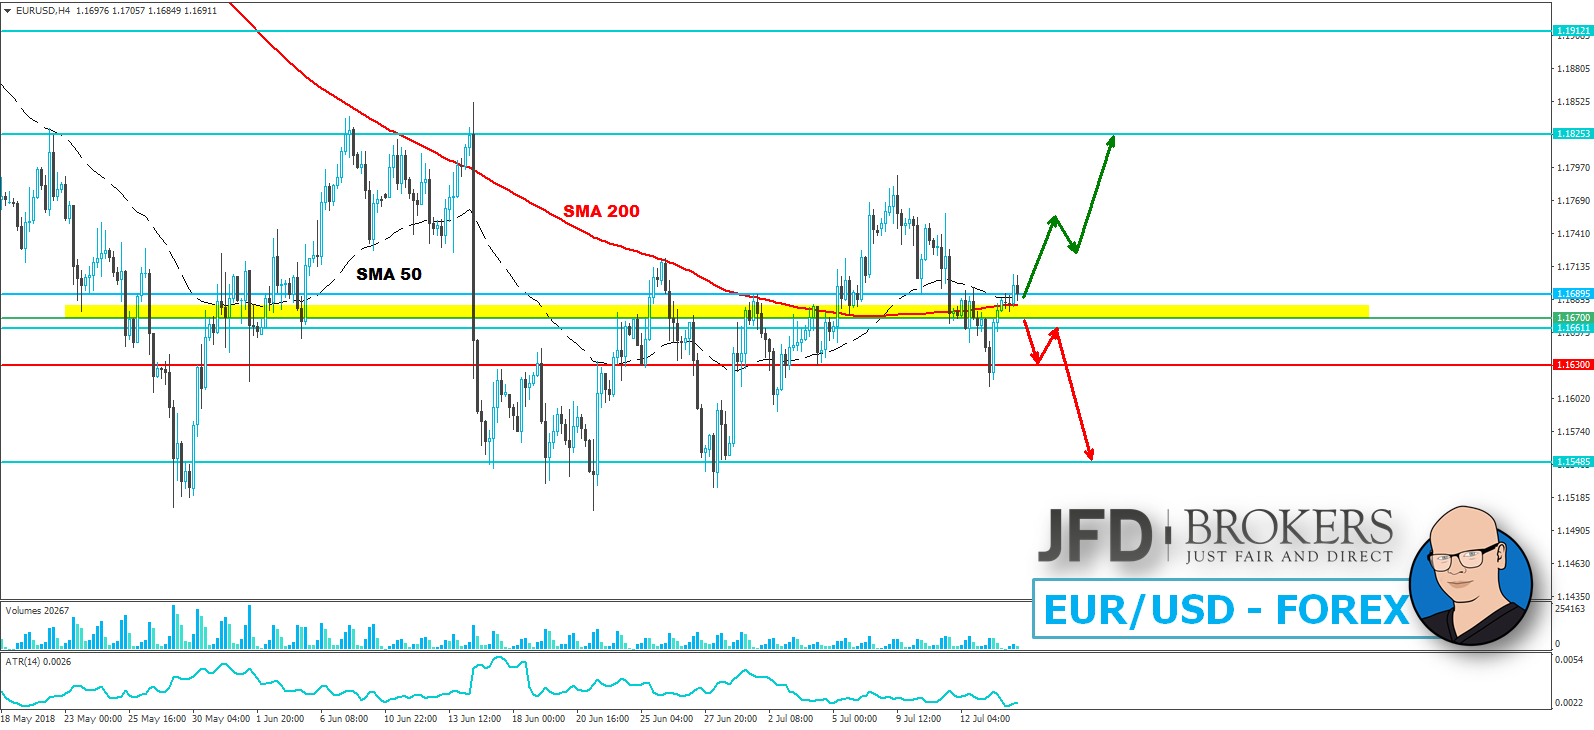 JFD-Wochenausblick-EUR-USD-GBP-USD-DAX-und-WTI-16-07-2018-20-07-2018-Kommentar-JFD-Brokers-GodmodeTrader.de-1